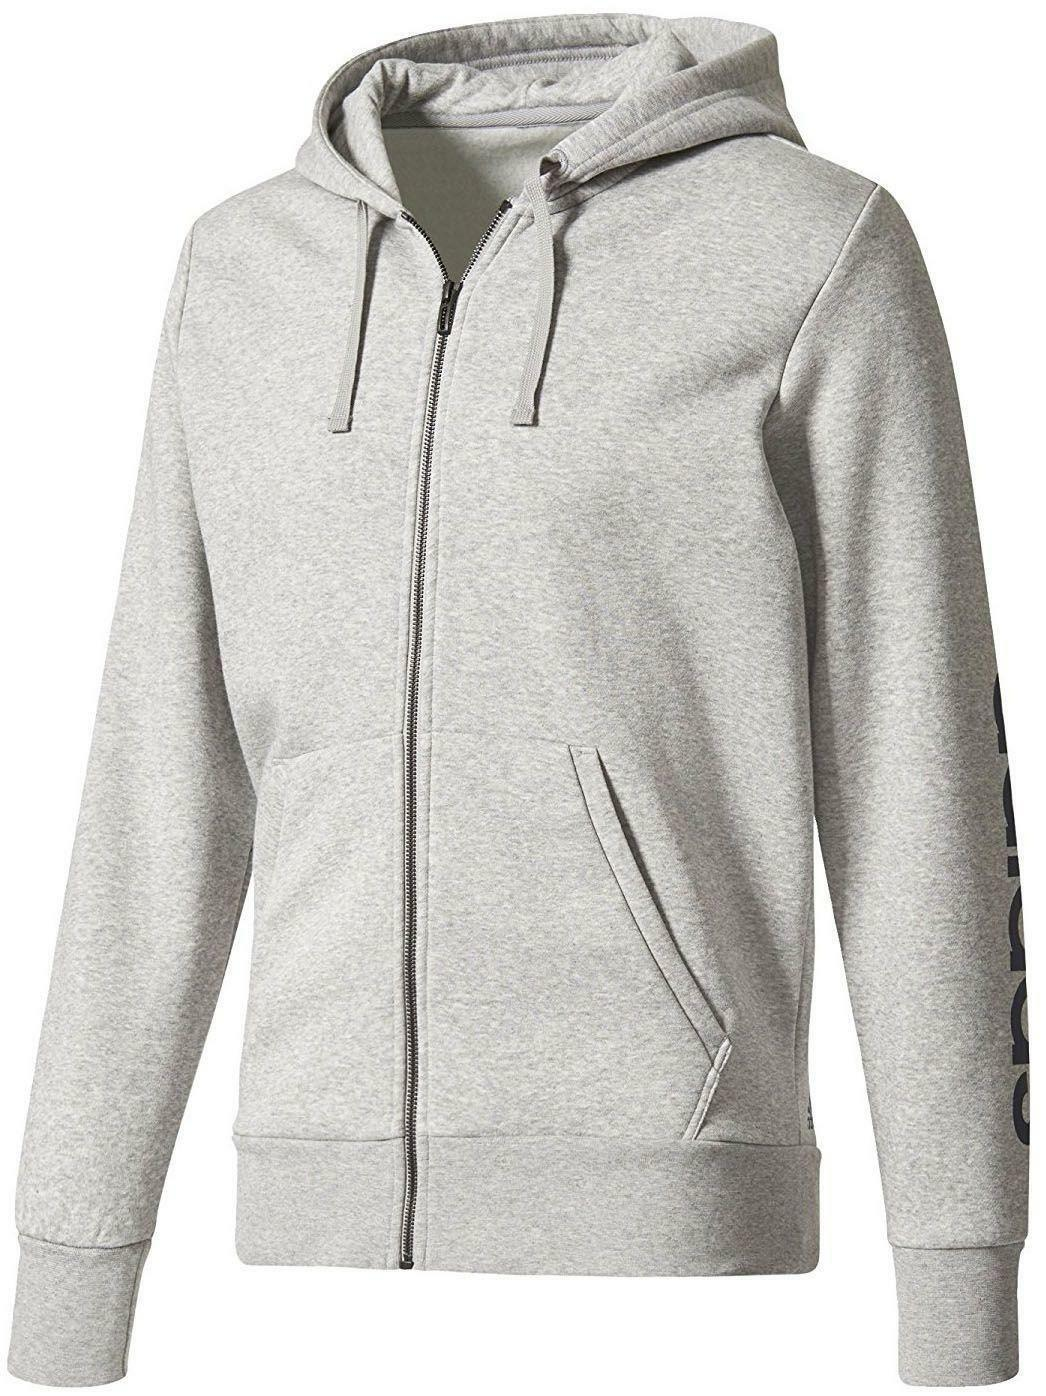 adidas adidas giacchetto uomo cotone felpato grigio bq9636